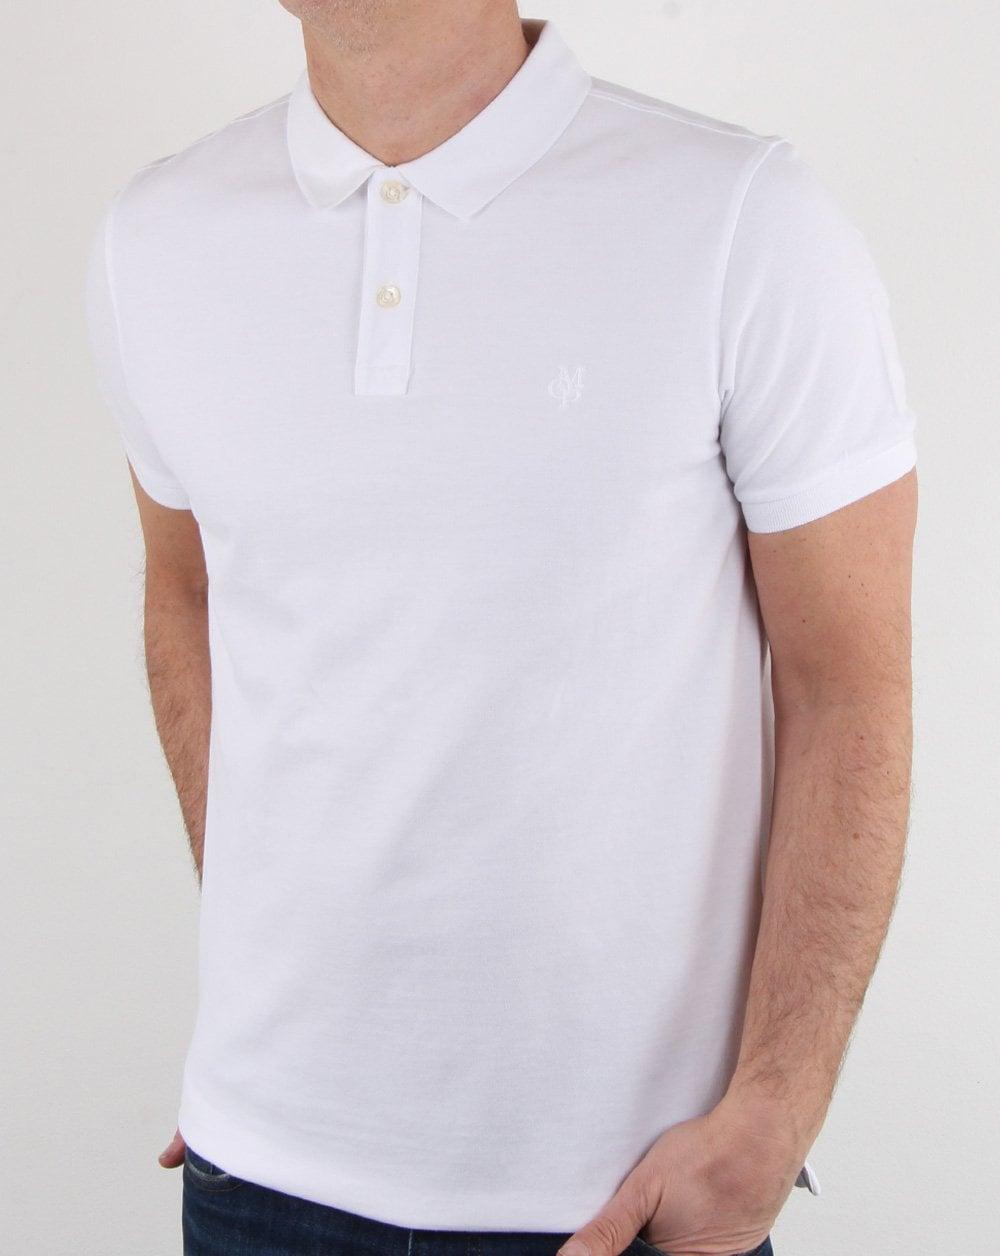 premium selection a2c03 83f0e Marc O Polo Polo Shirt White